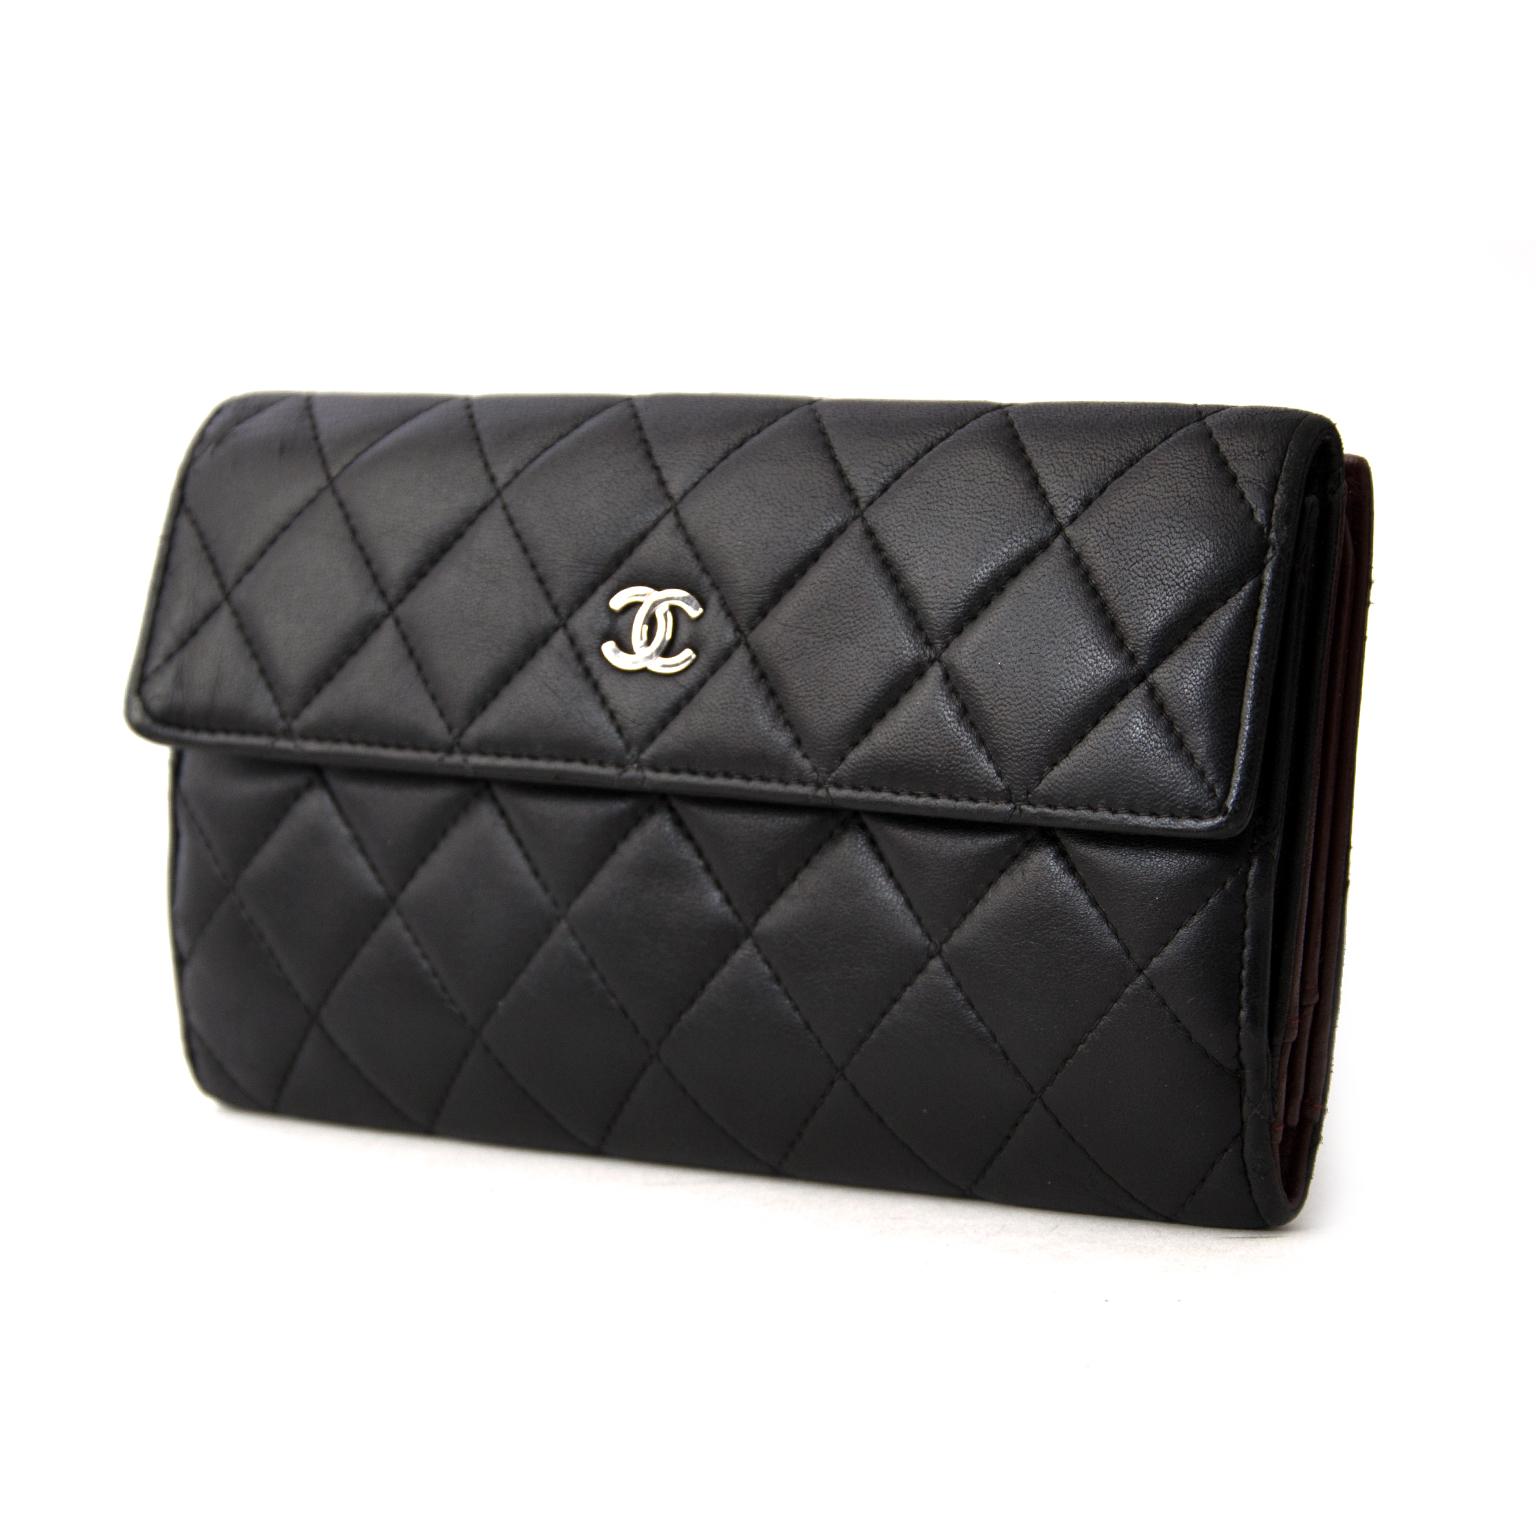 comme neuf Chanel Classic Black Lambskin Wallet pour le meilleur prix Chanel Classic Black Lambskin Wallet